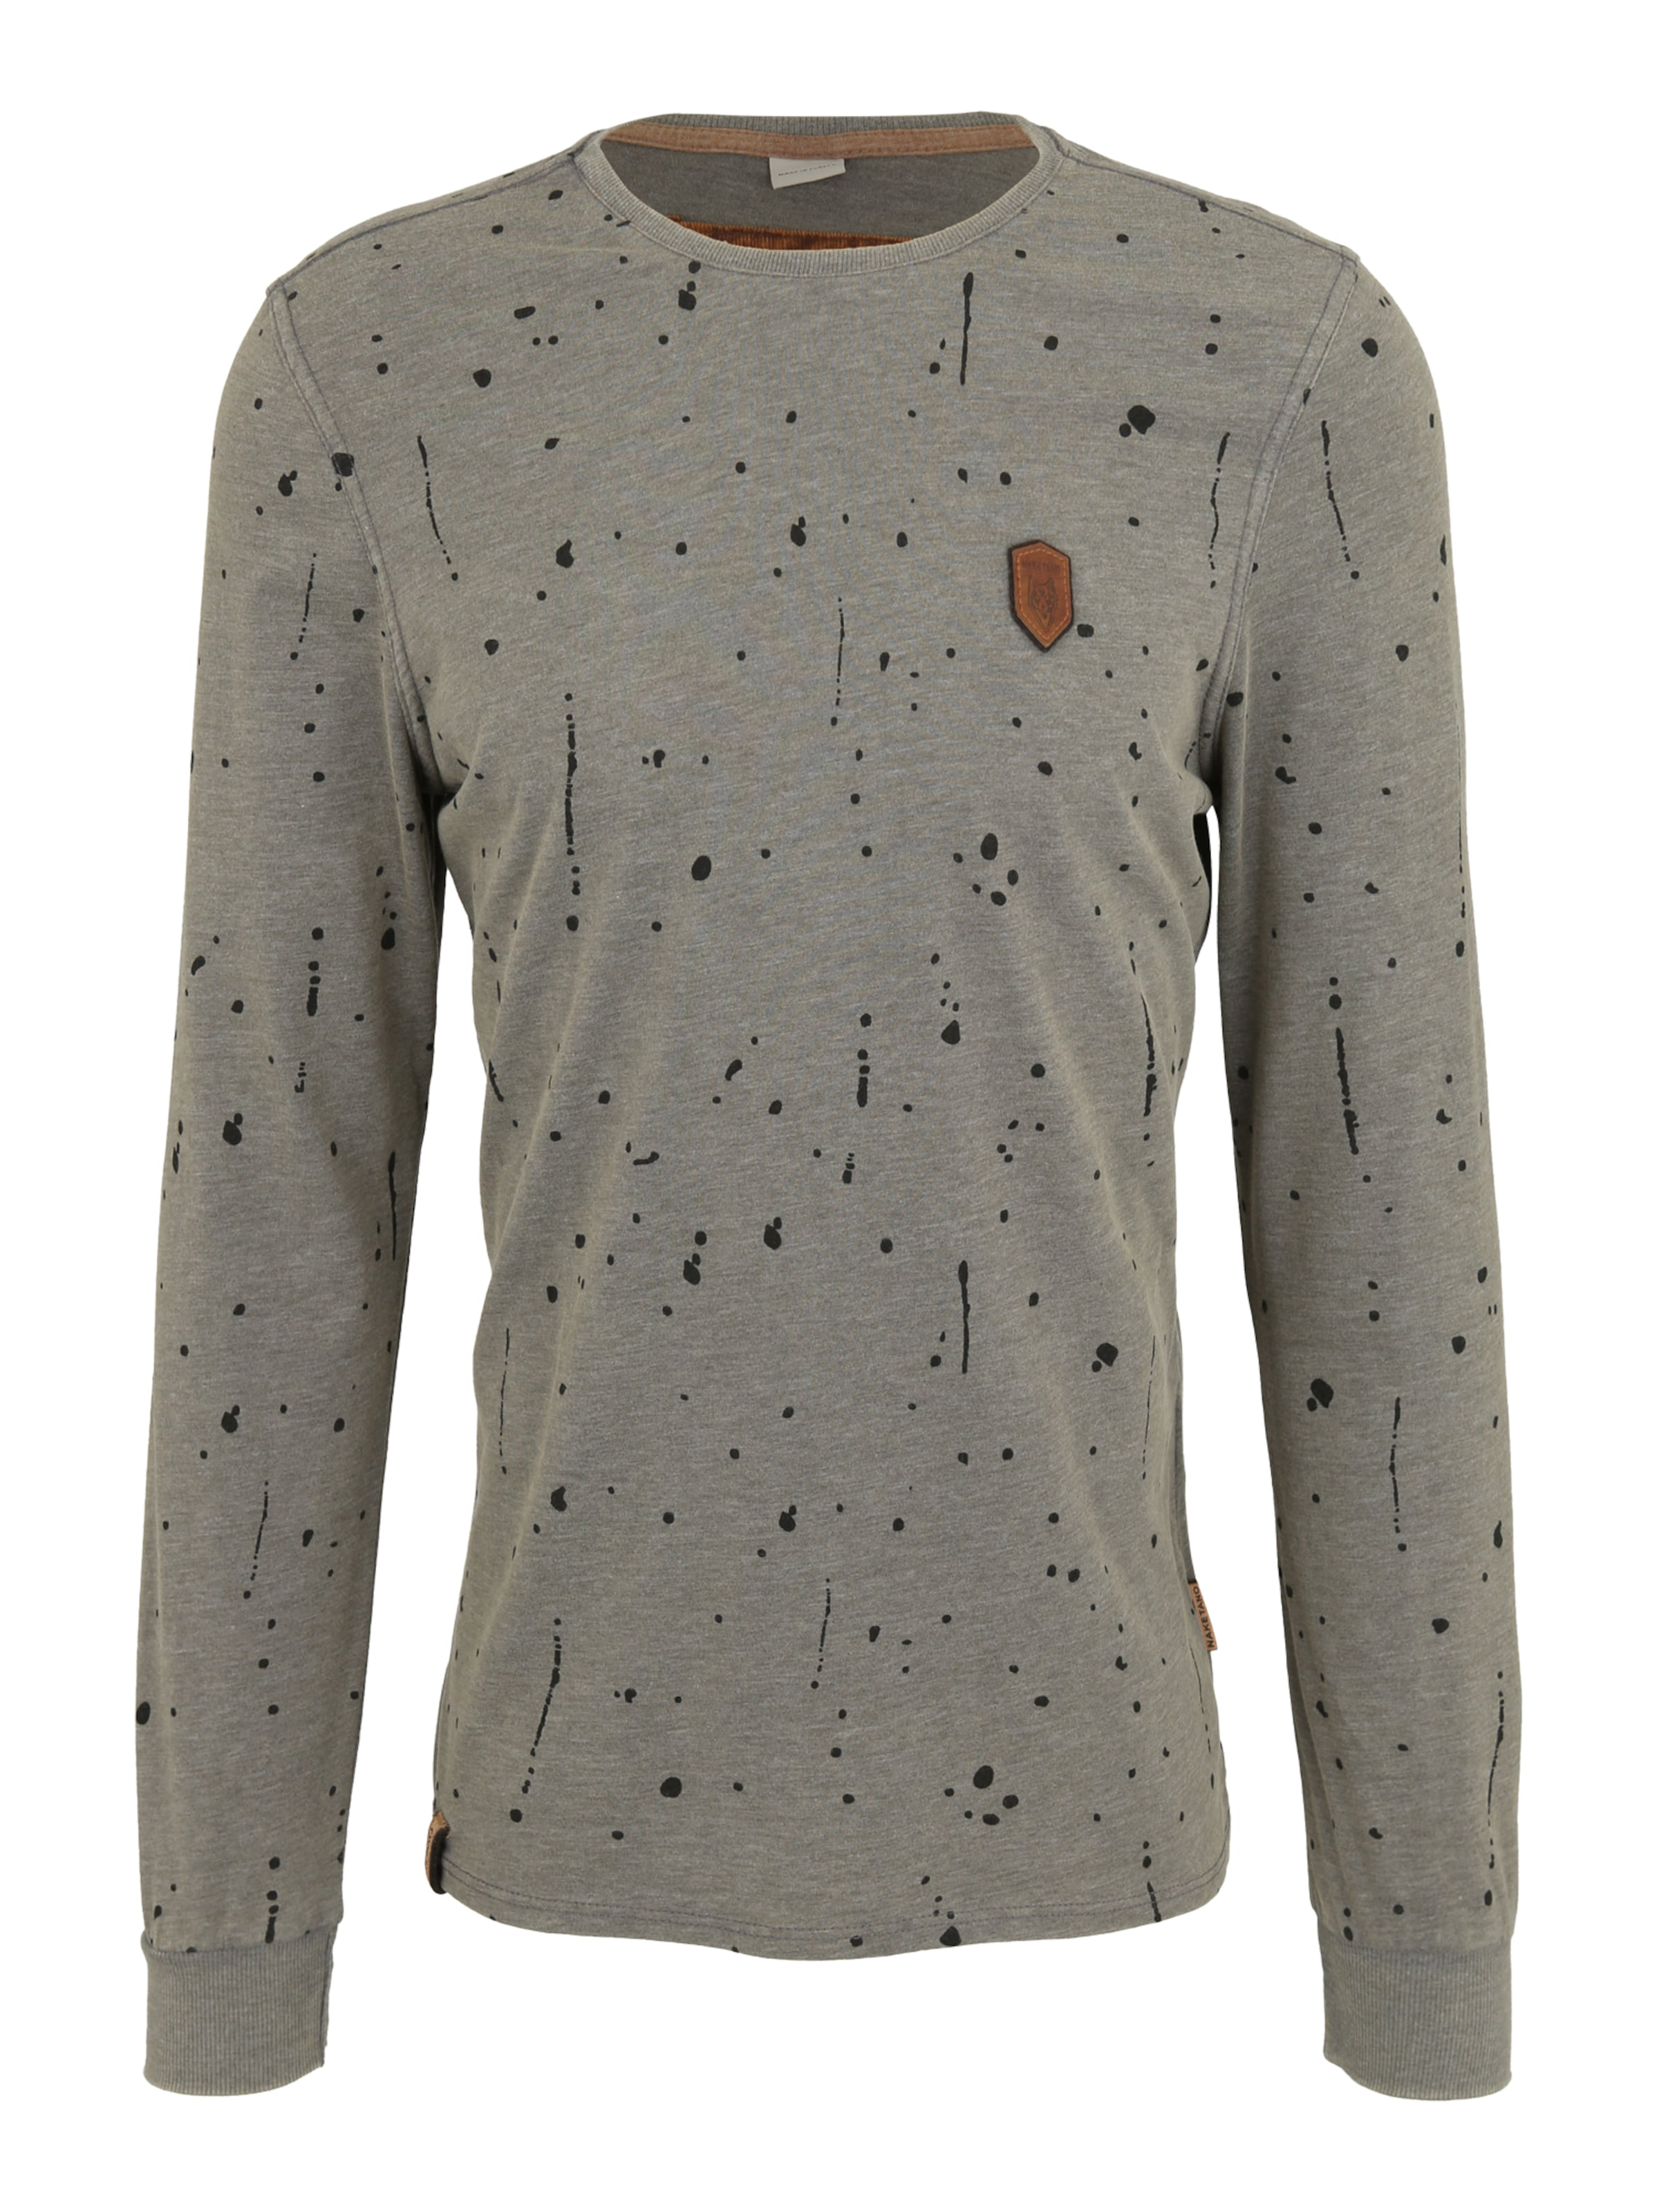 Men' Naketano Sweat En shirt Gris Foncé 'nordschleife Made 6yfbY7g